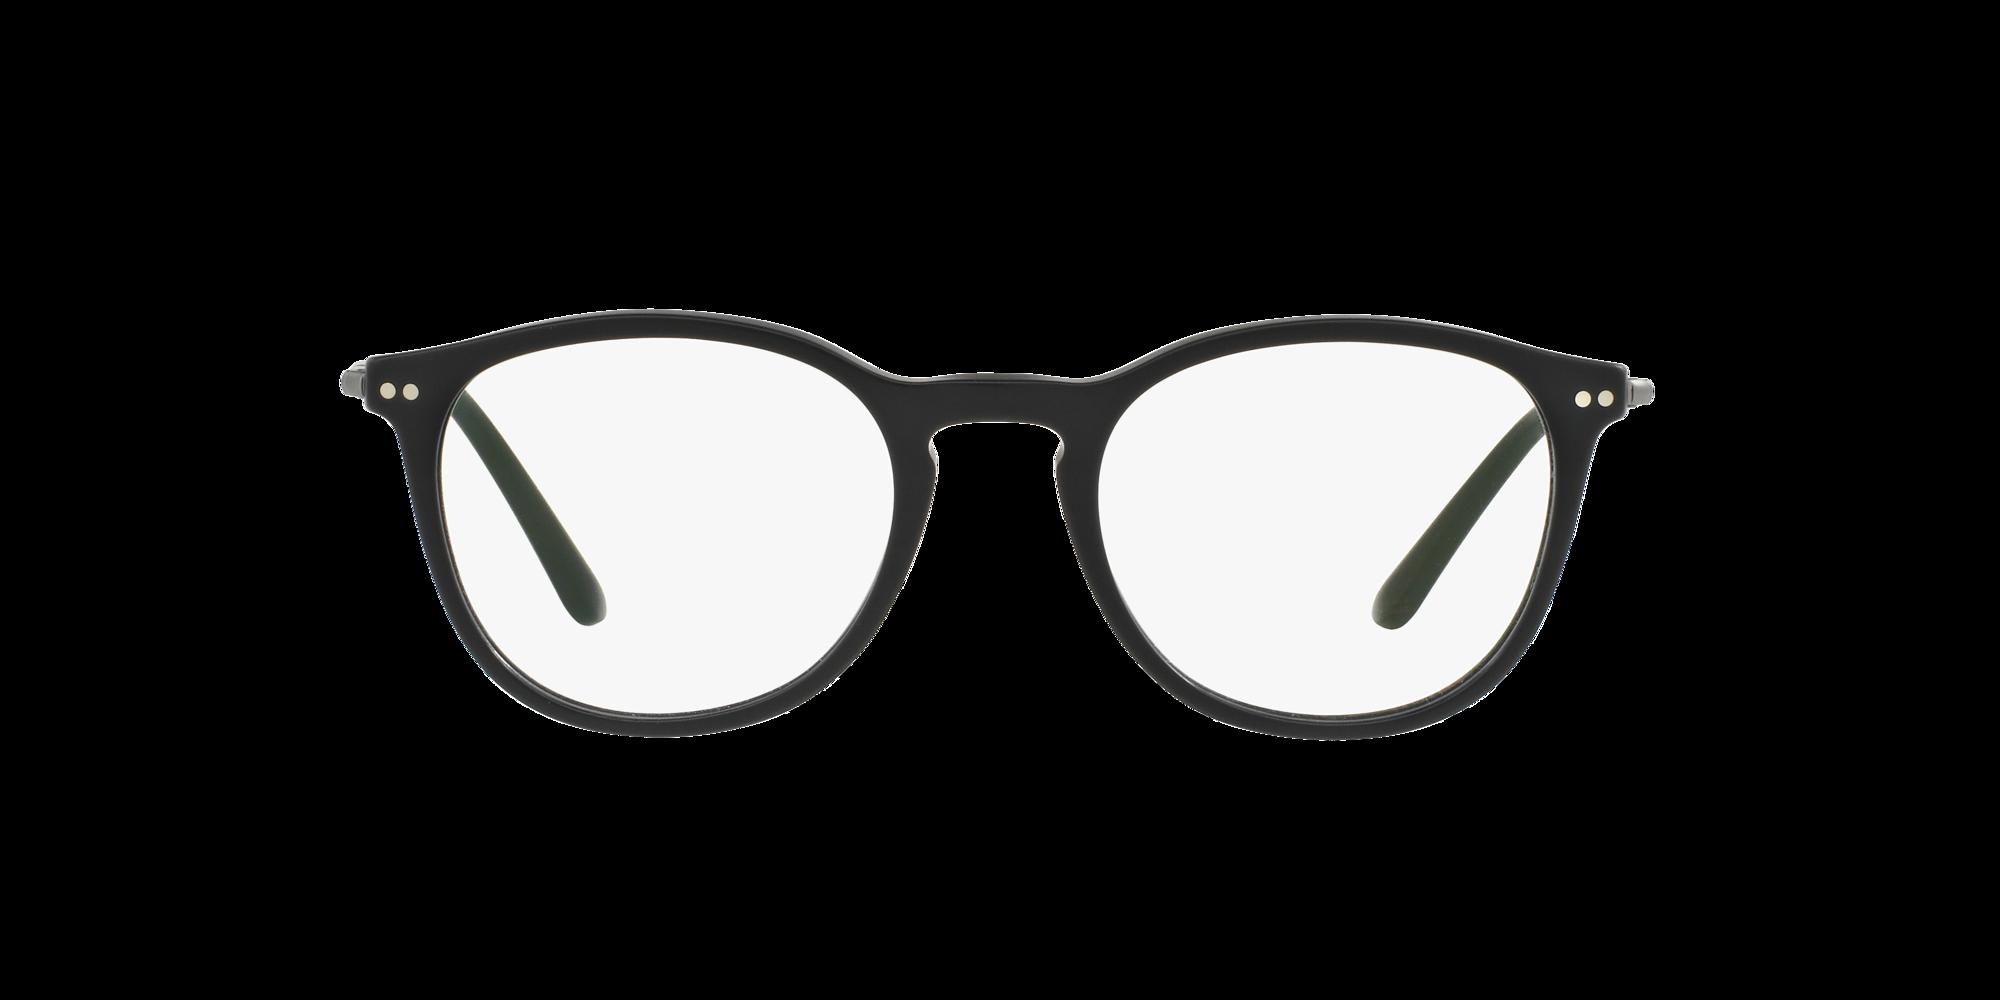 Image for AR7125 from LensCrafters | Glasses, Prescription Glasses Online, Eyewear